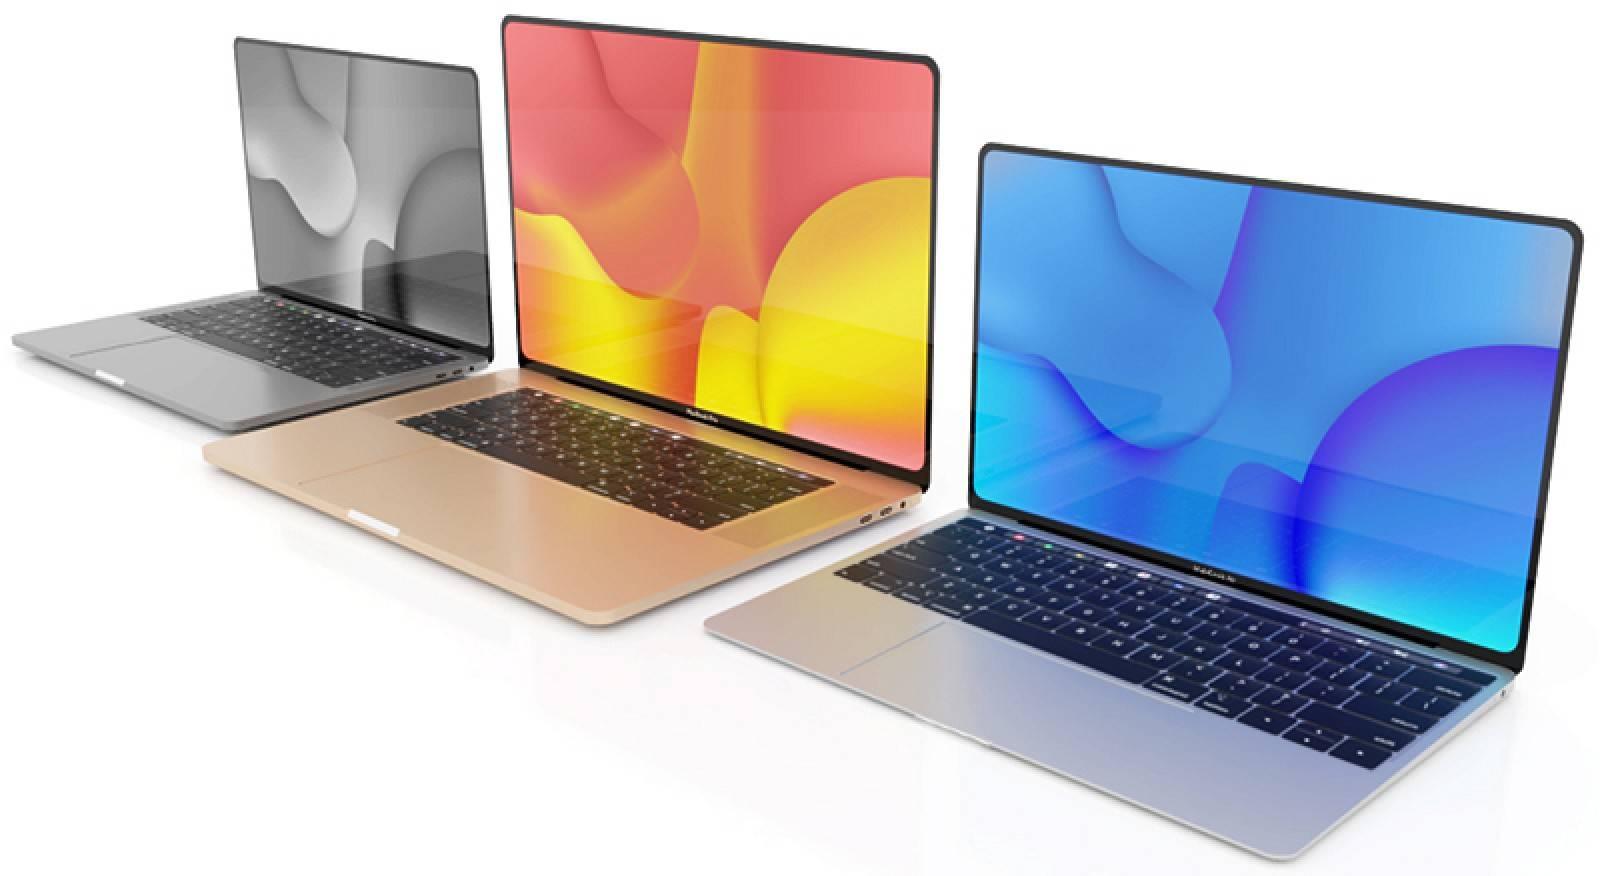 MacBook Pro 16 Inch va fi lansat in octombrie la un pret ridicol